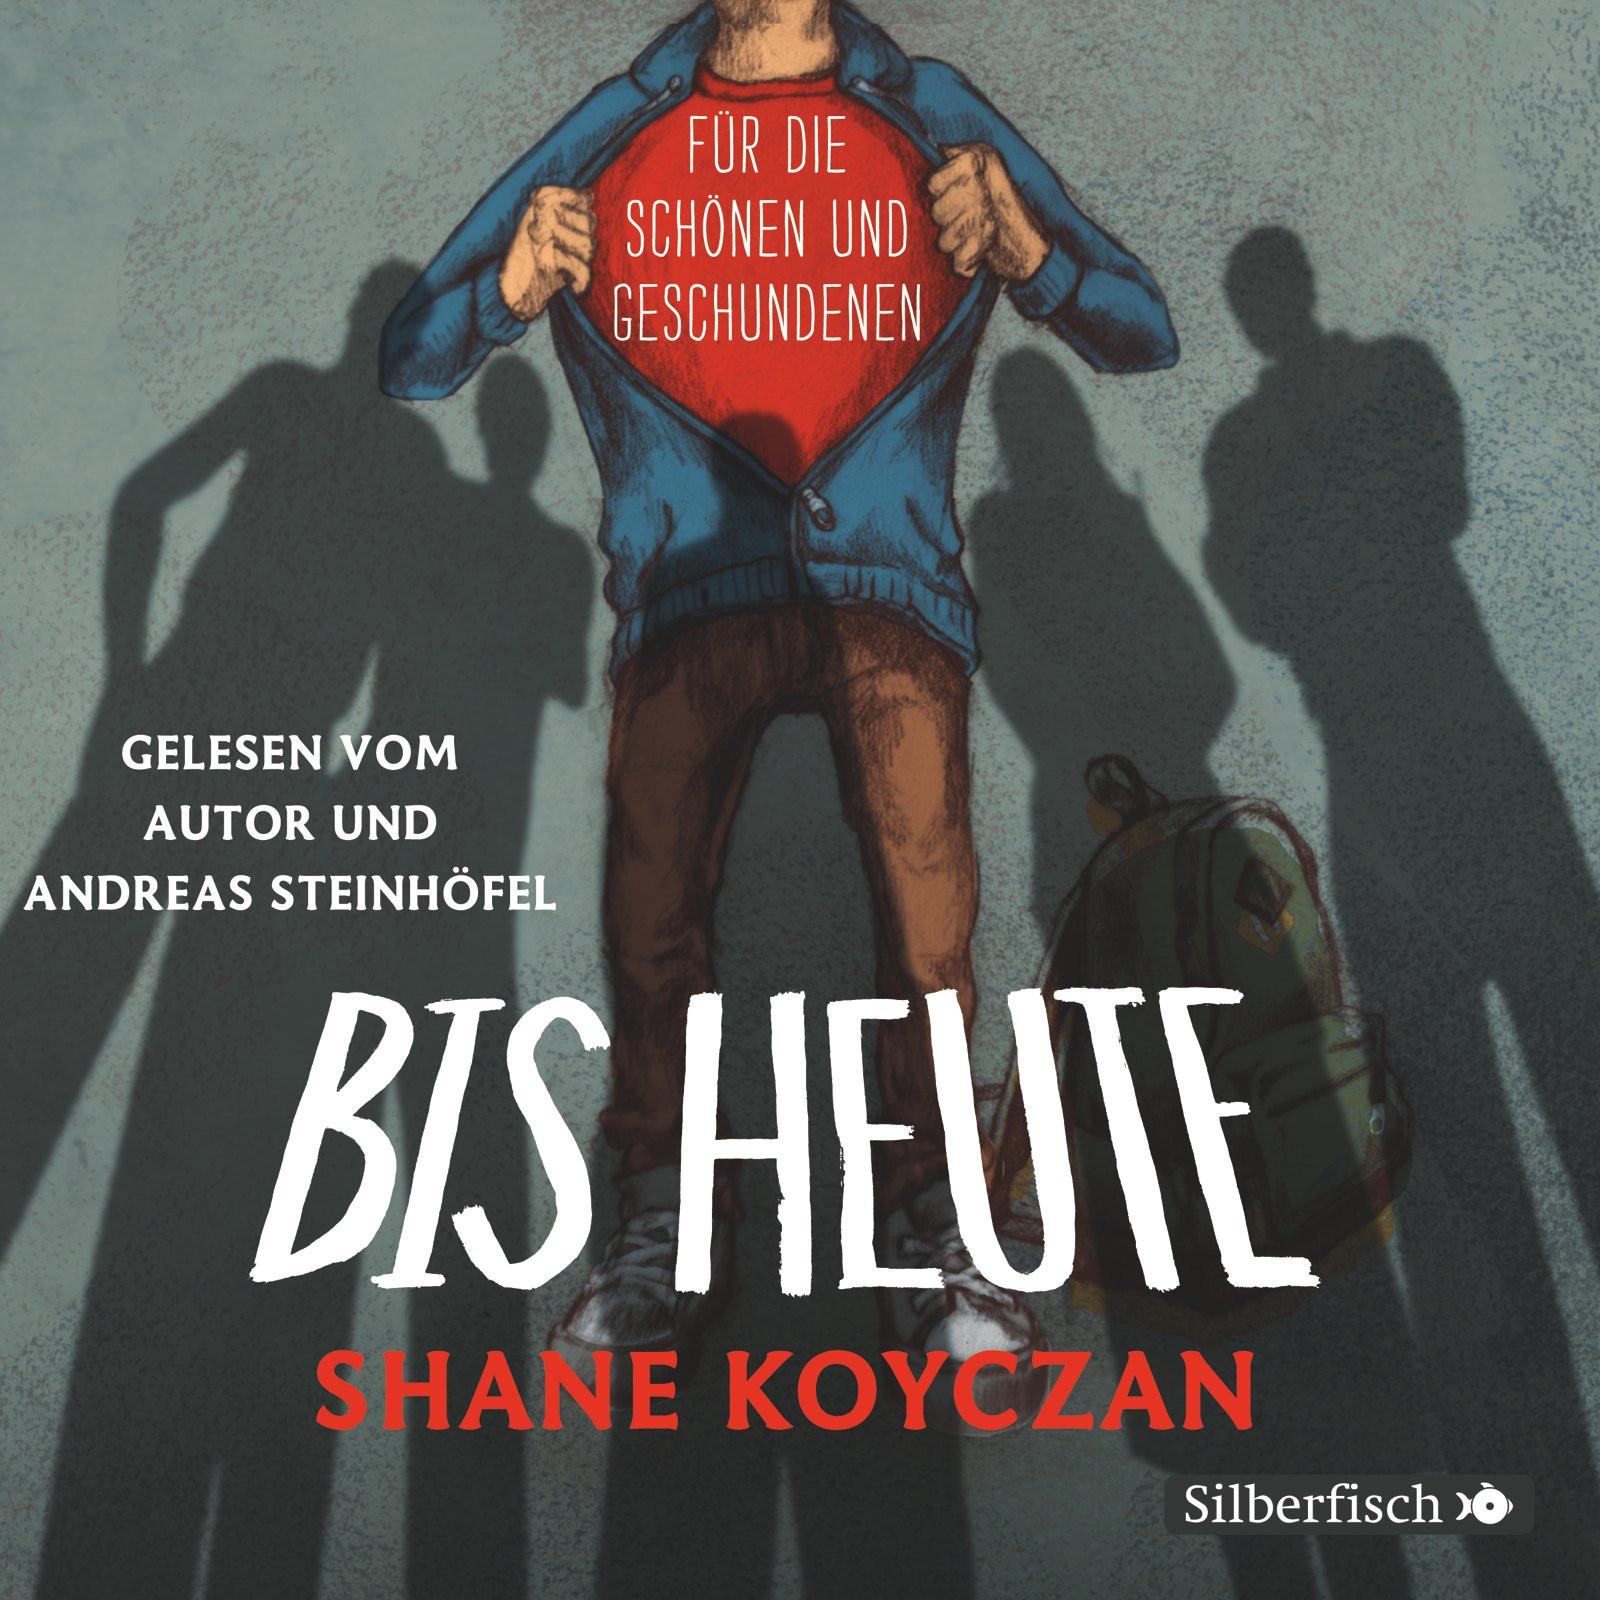 Shane Koyczan - Bis heute